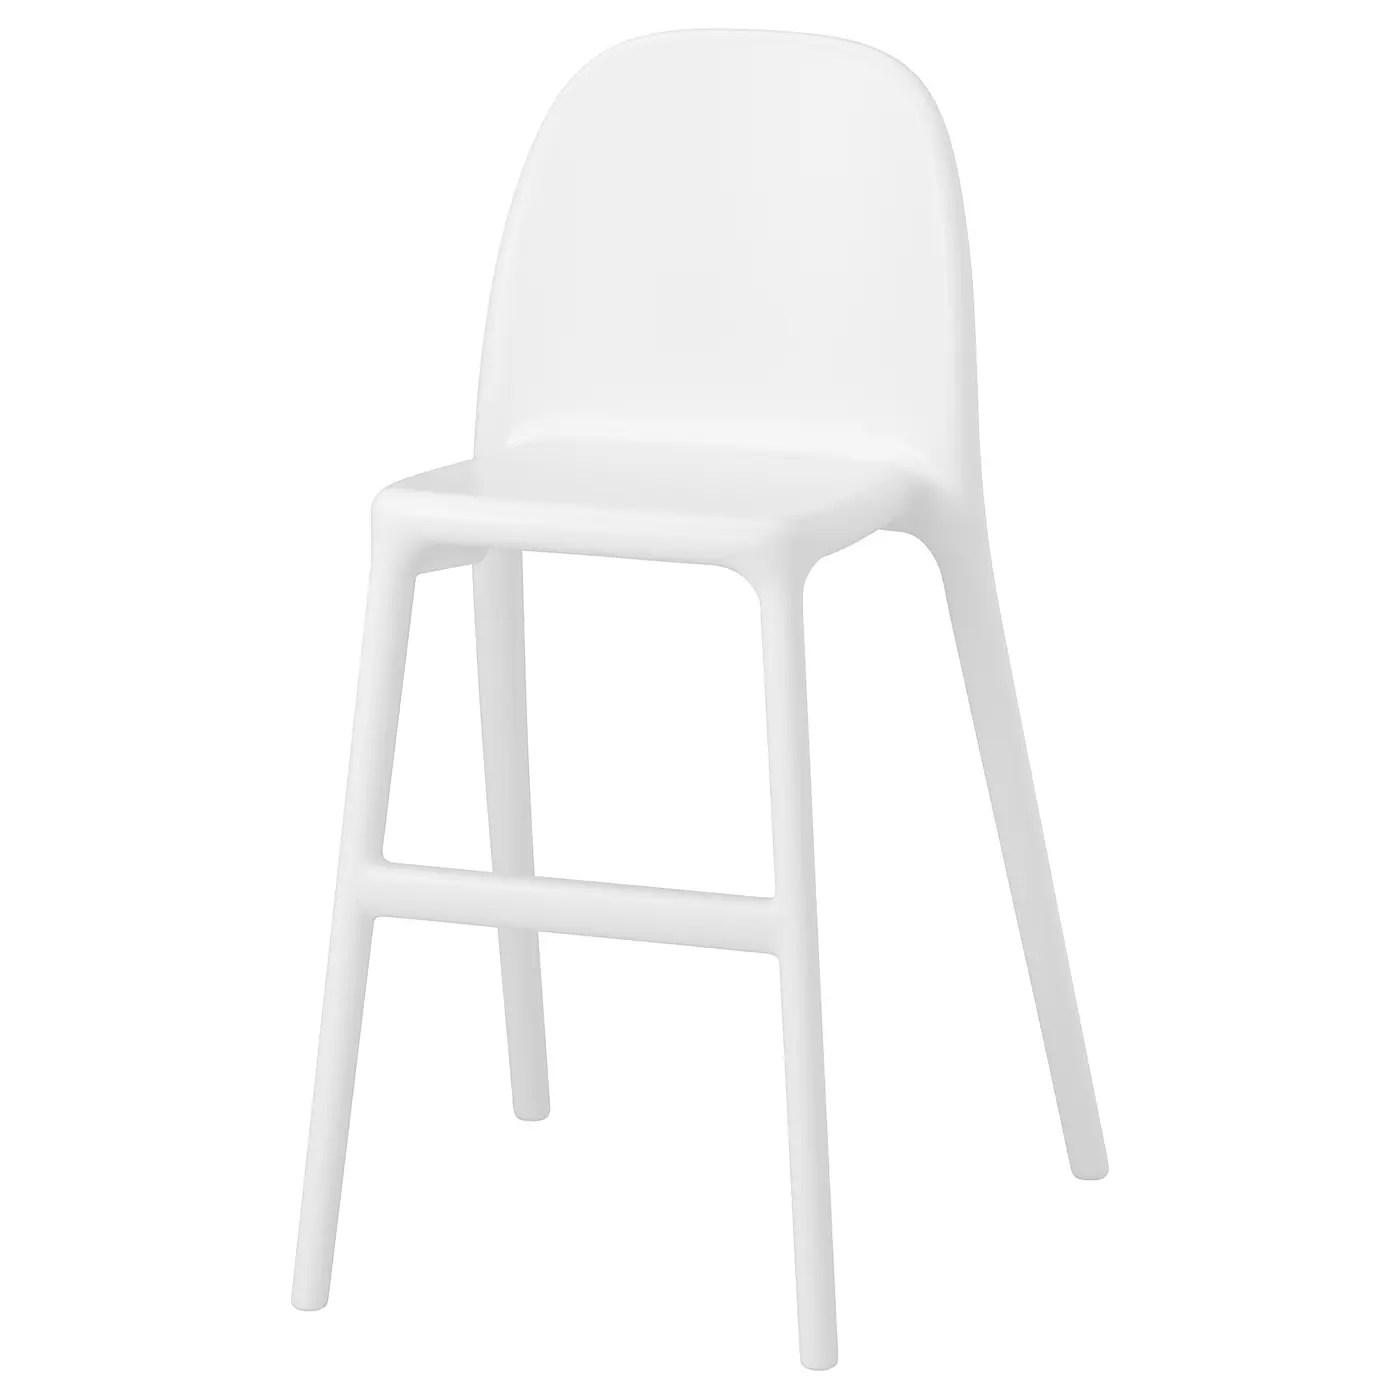 urban chaise enfant blanc